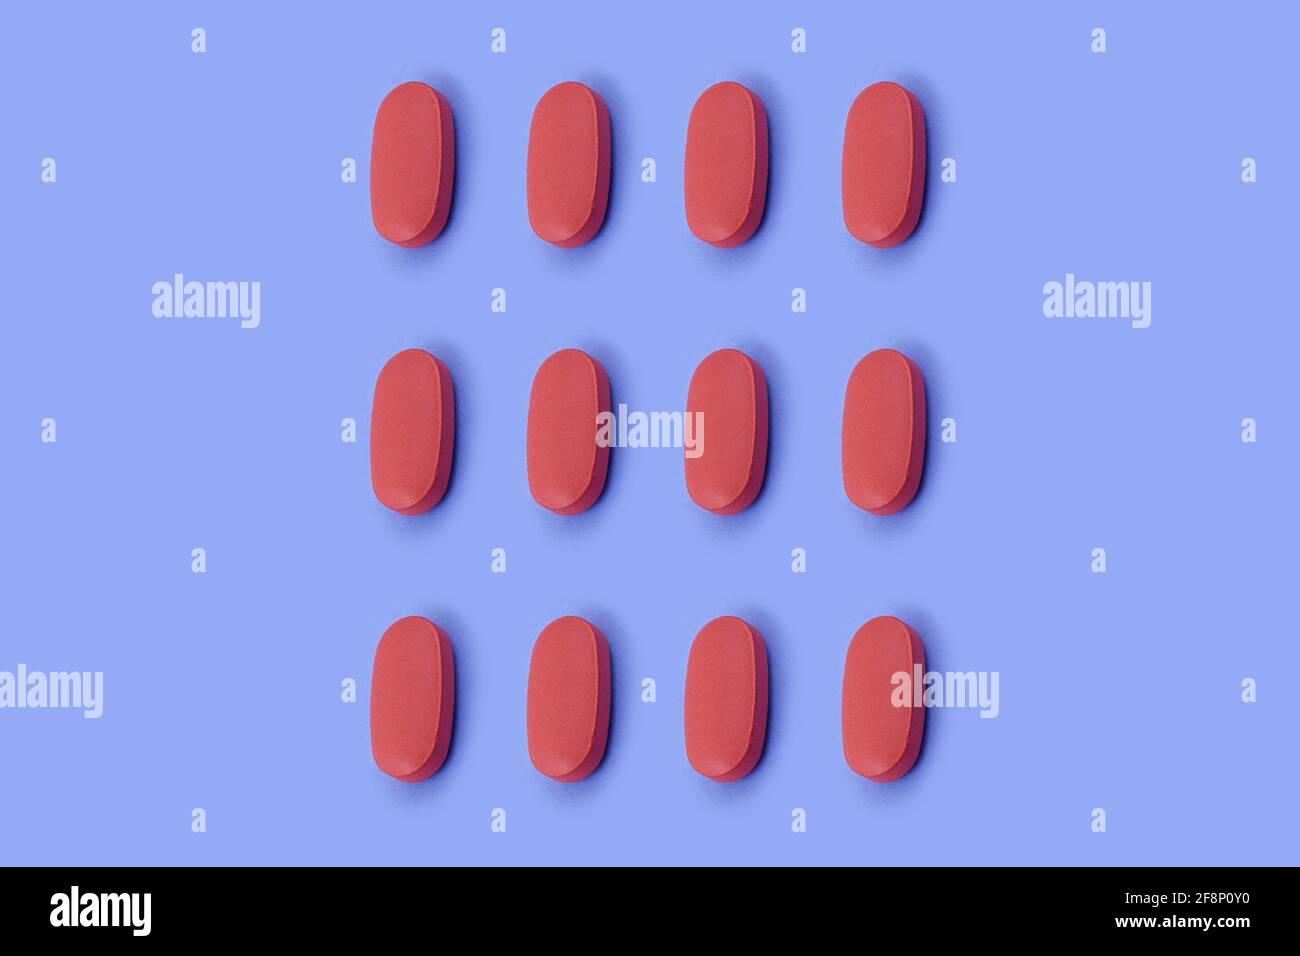 Forma ovalada tableta de medicina farmacéutica sobre fondo azul, Medicina conceptos creativos estilo mínimo con fondo de papel colorido Foto de stock